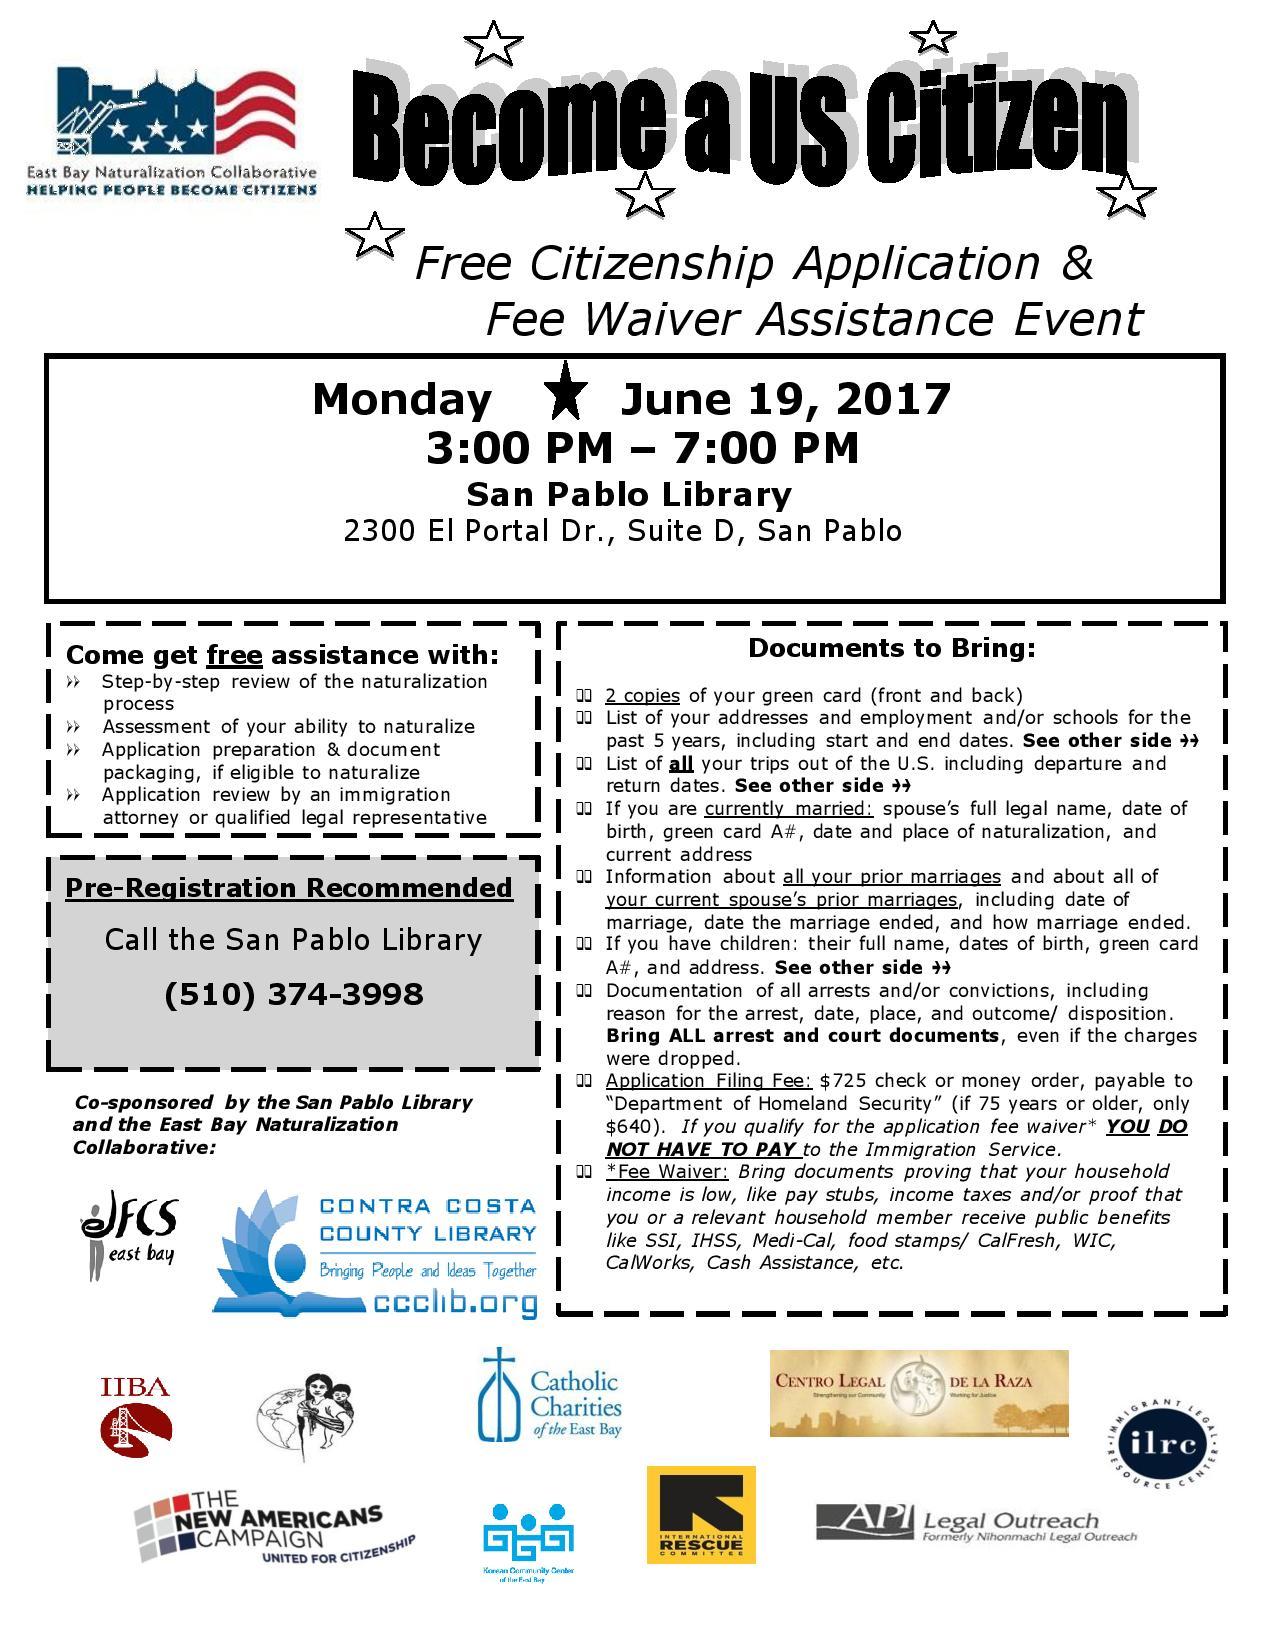 Citizenship workshop san pablo 61917 east bay naturalization san pablo 61917 english flyer page 001 free citizenship application falaconquin